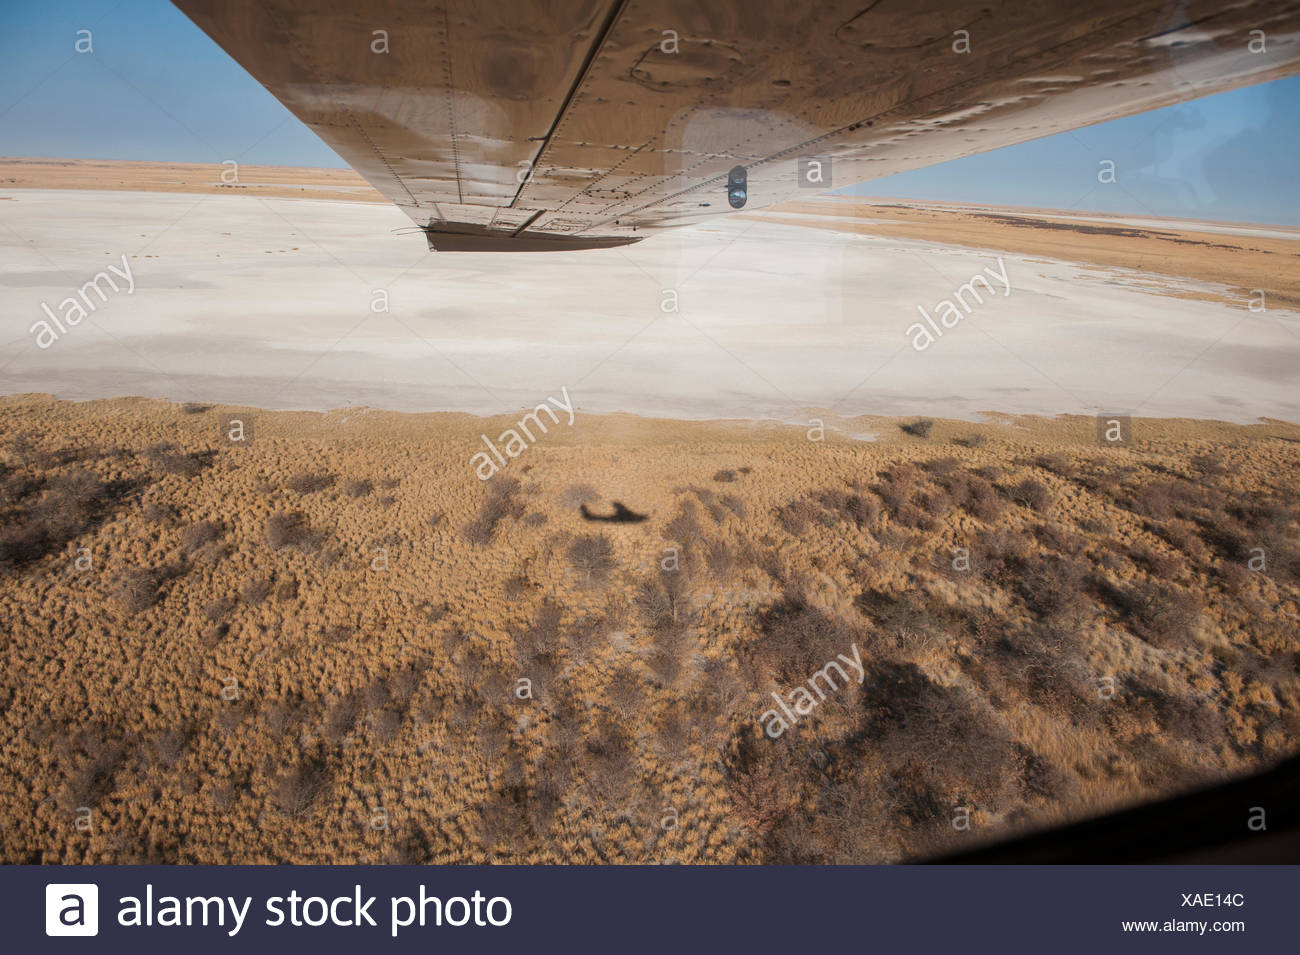 Vast and otherworldly, the salt pans of Botswana's Kalahari Desert dwarf a bush plane's shadow. - Stock Image